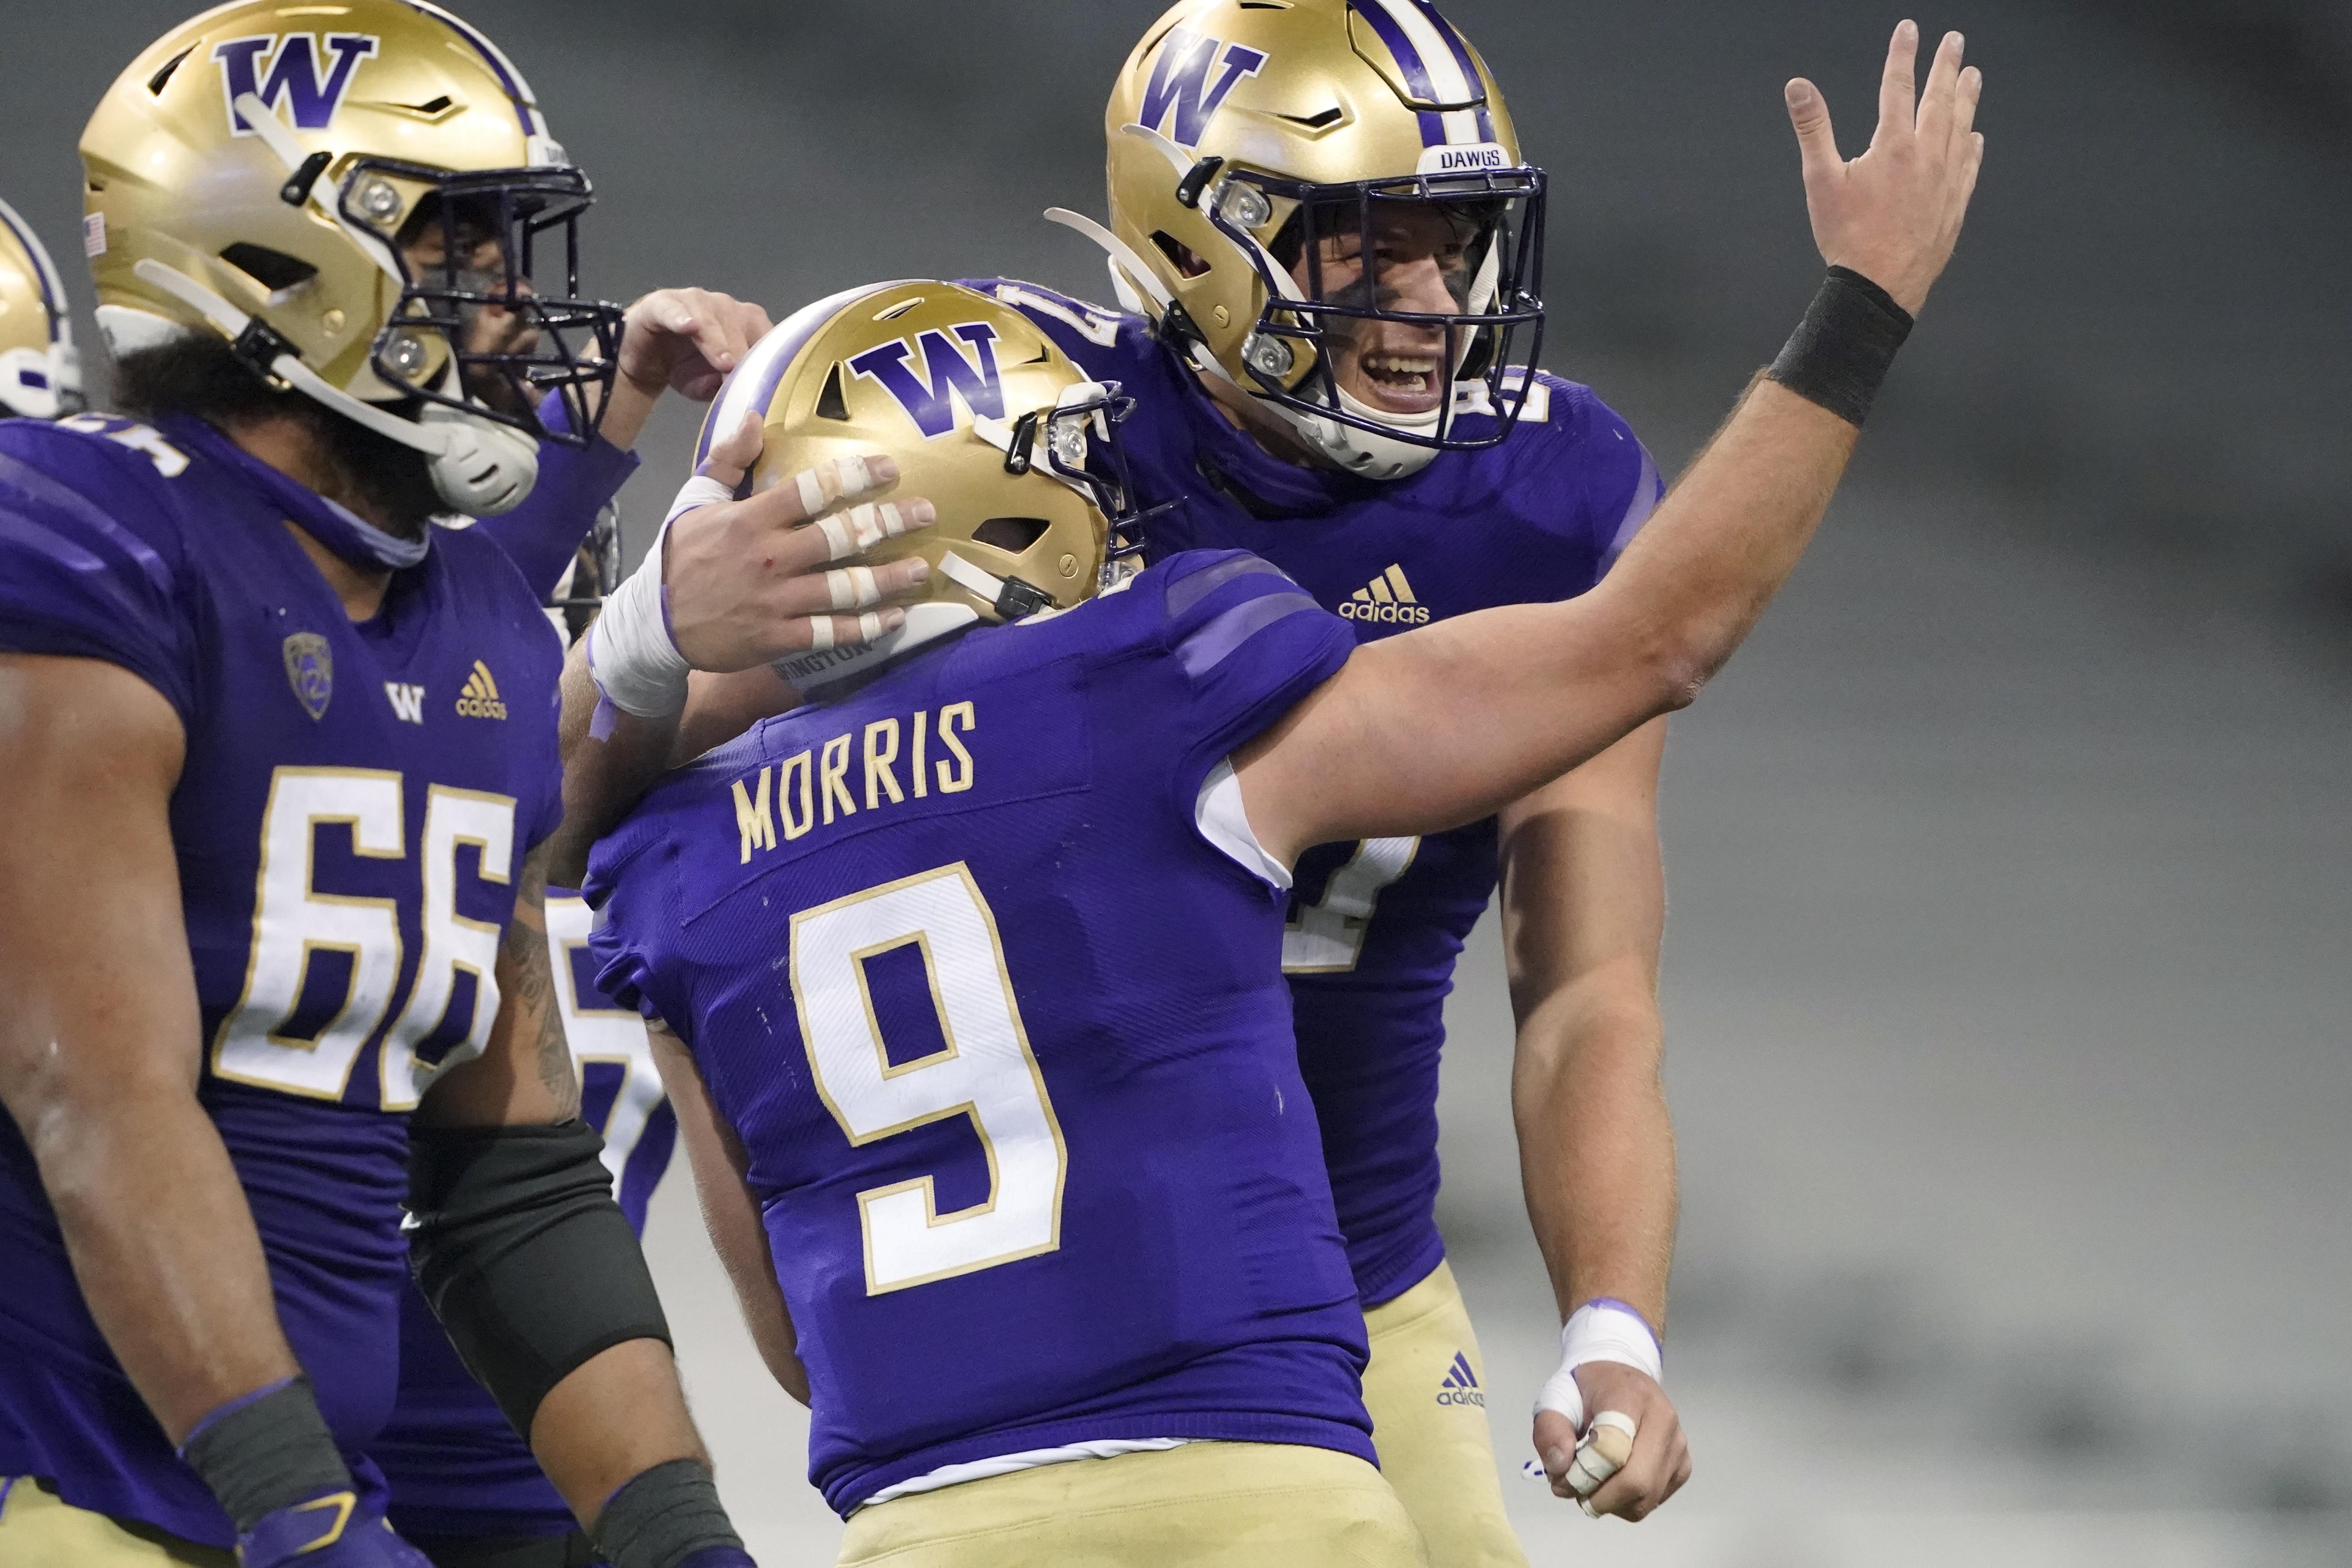 Washington quarterback Dylan Morris celebrates with tight end Cade Otton after an Otton touchdown reception against Utah.